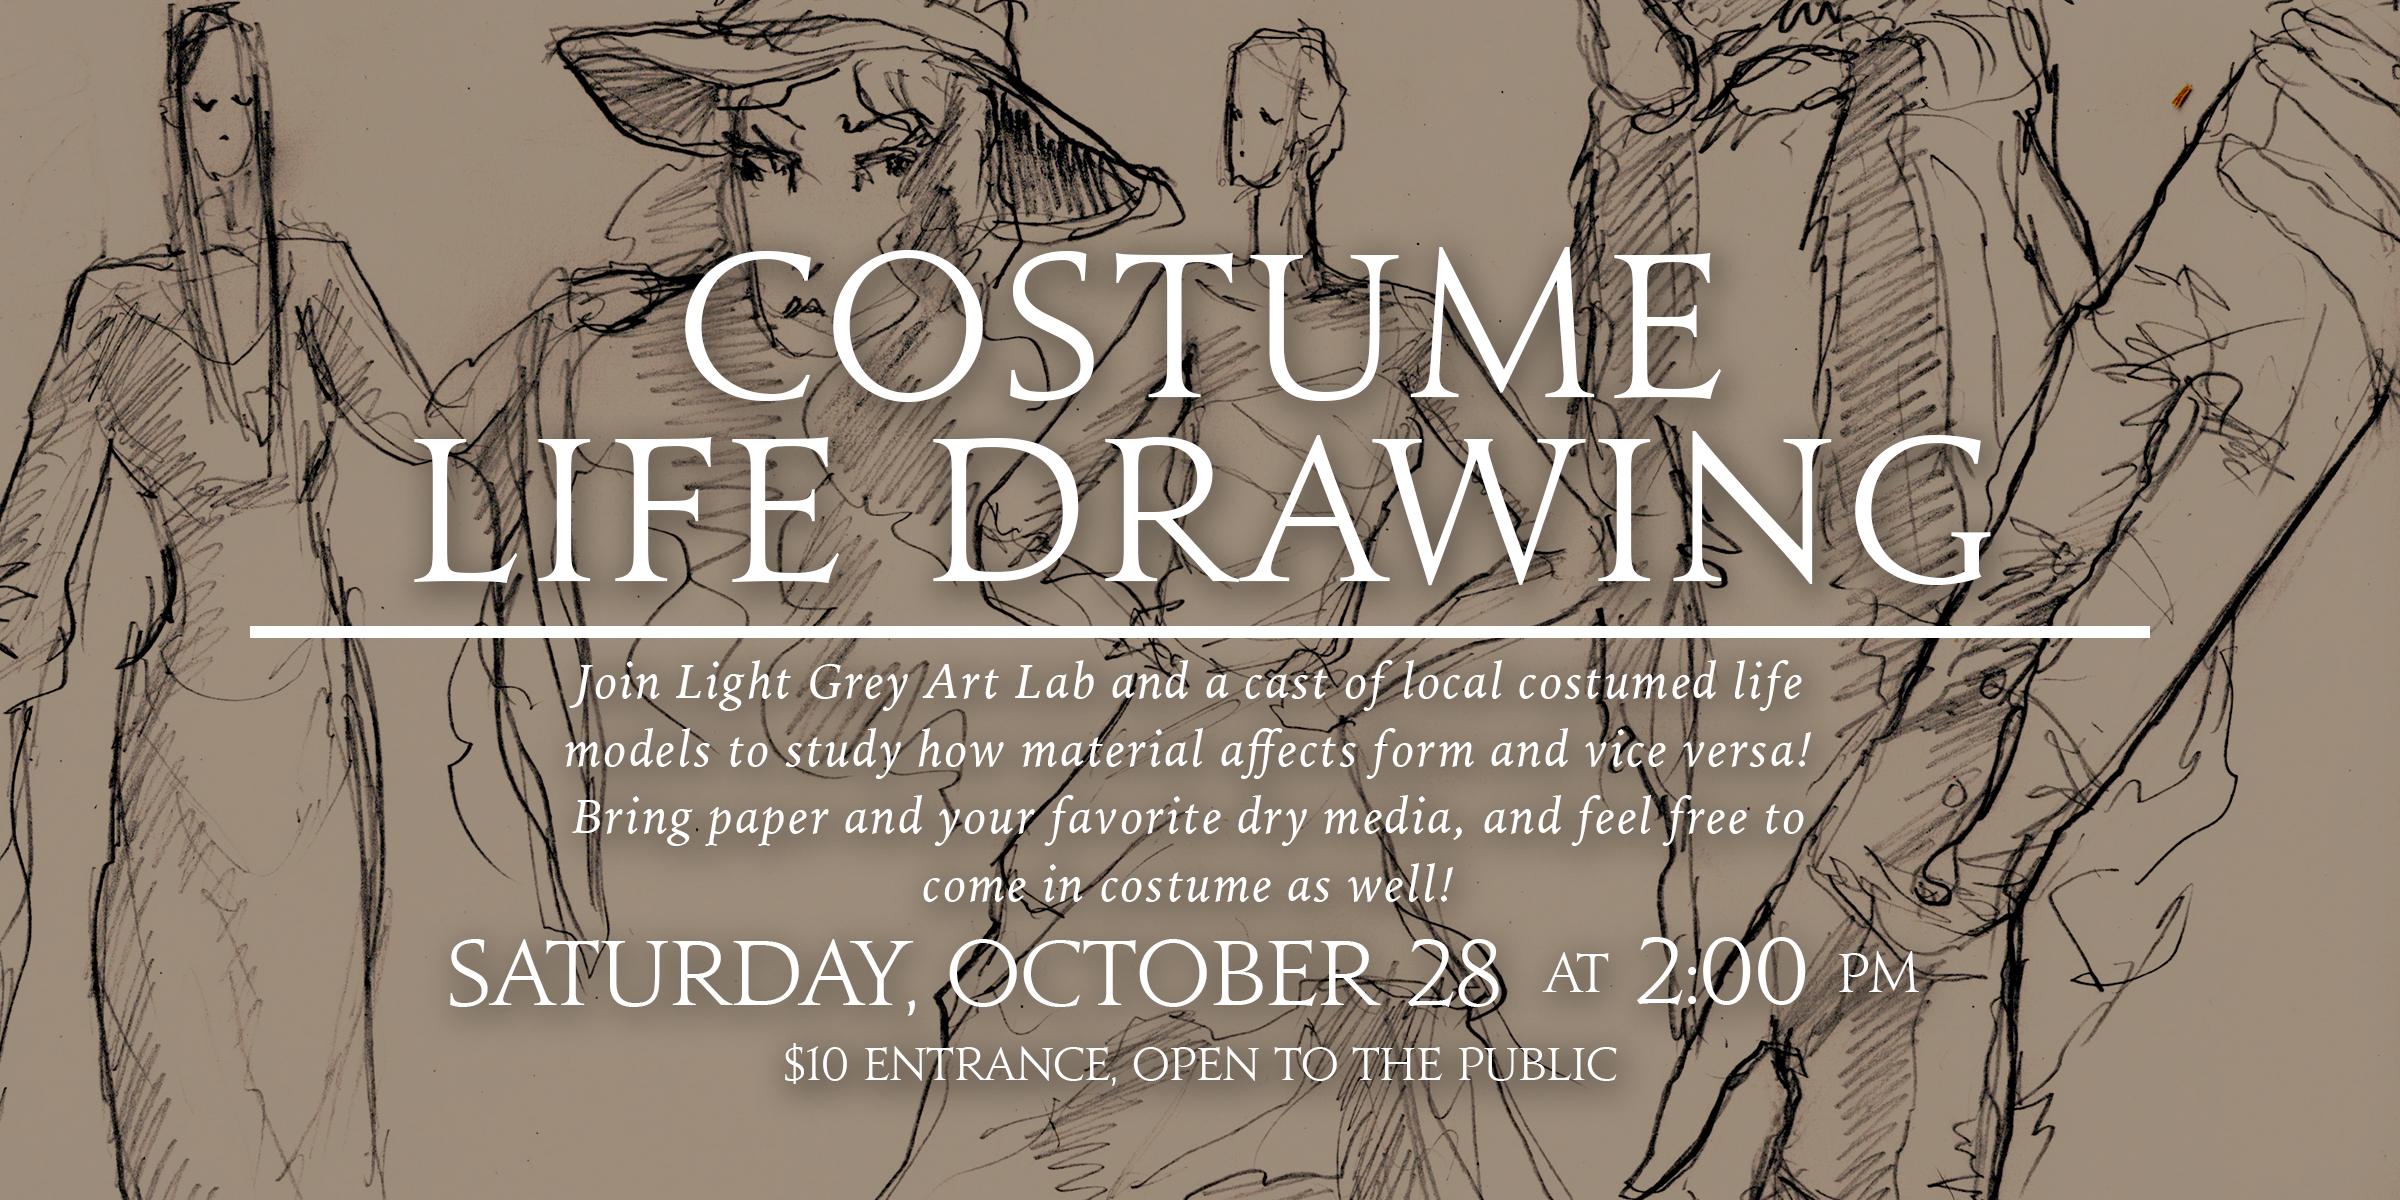 costume_life_drawing.jpg